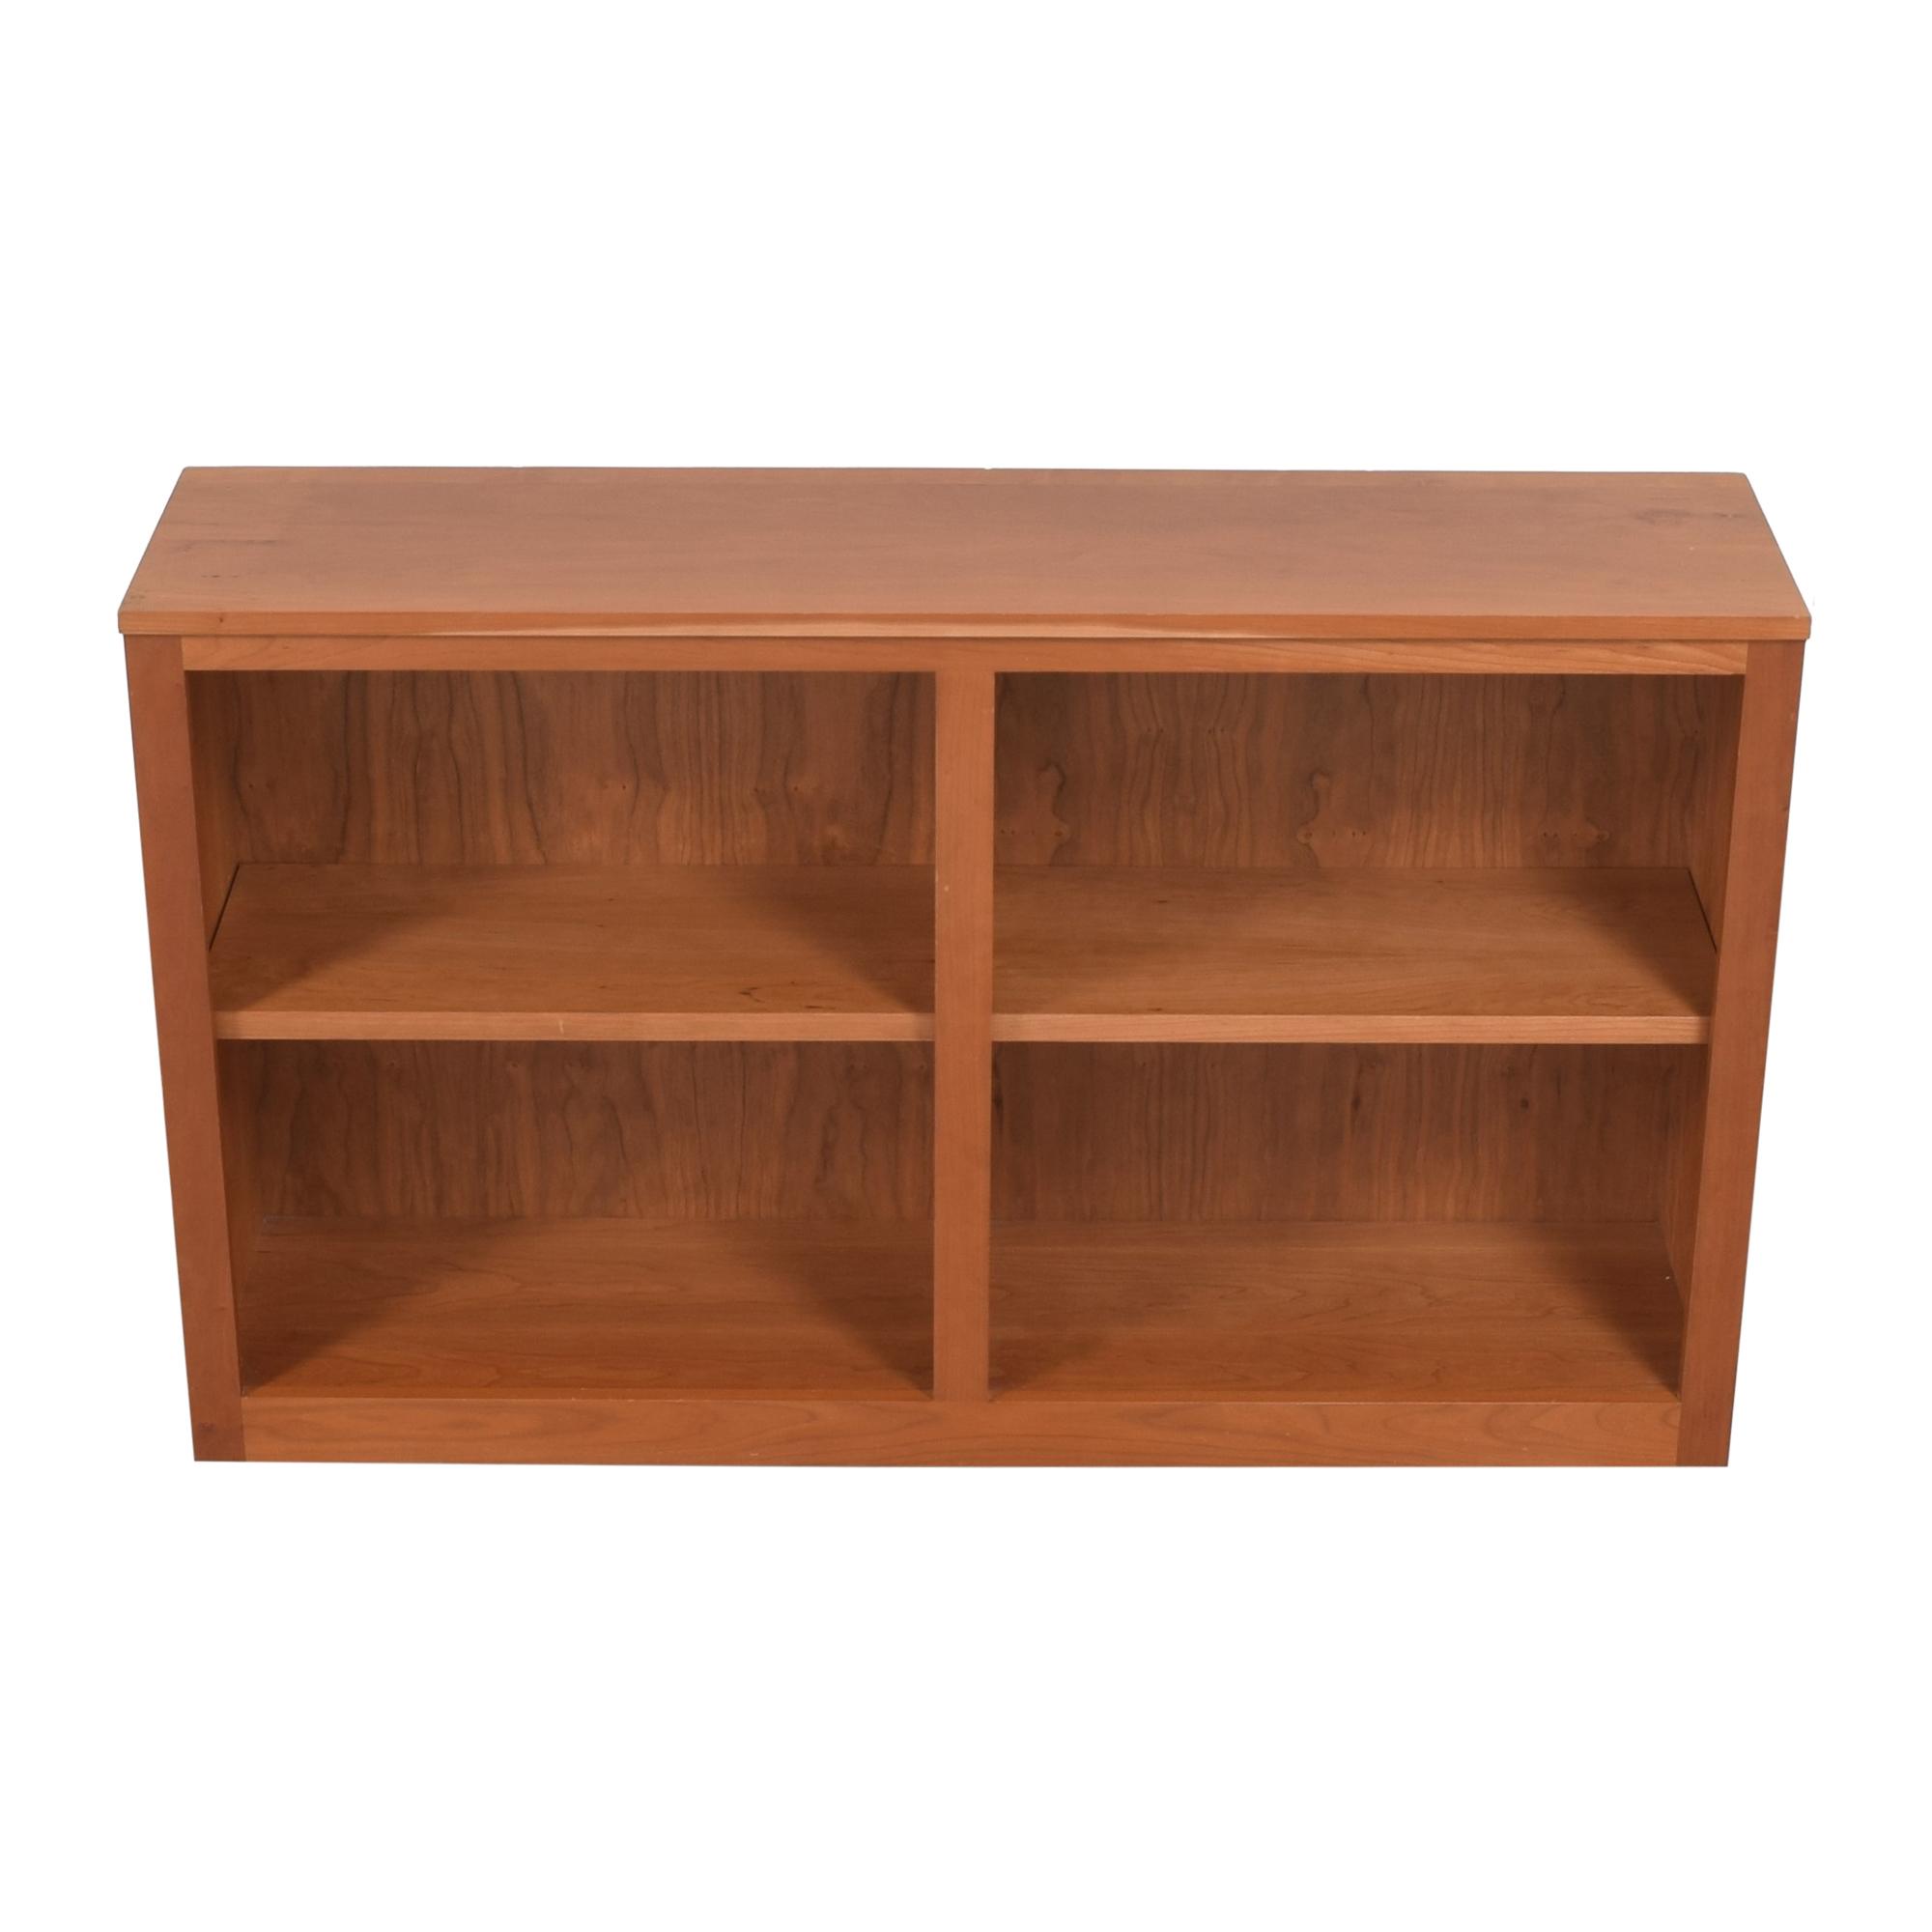 Room & Board Room & Board Woodwind Custom Bookcase brown